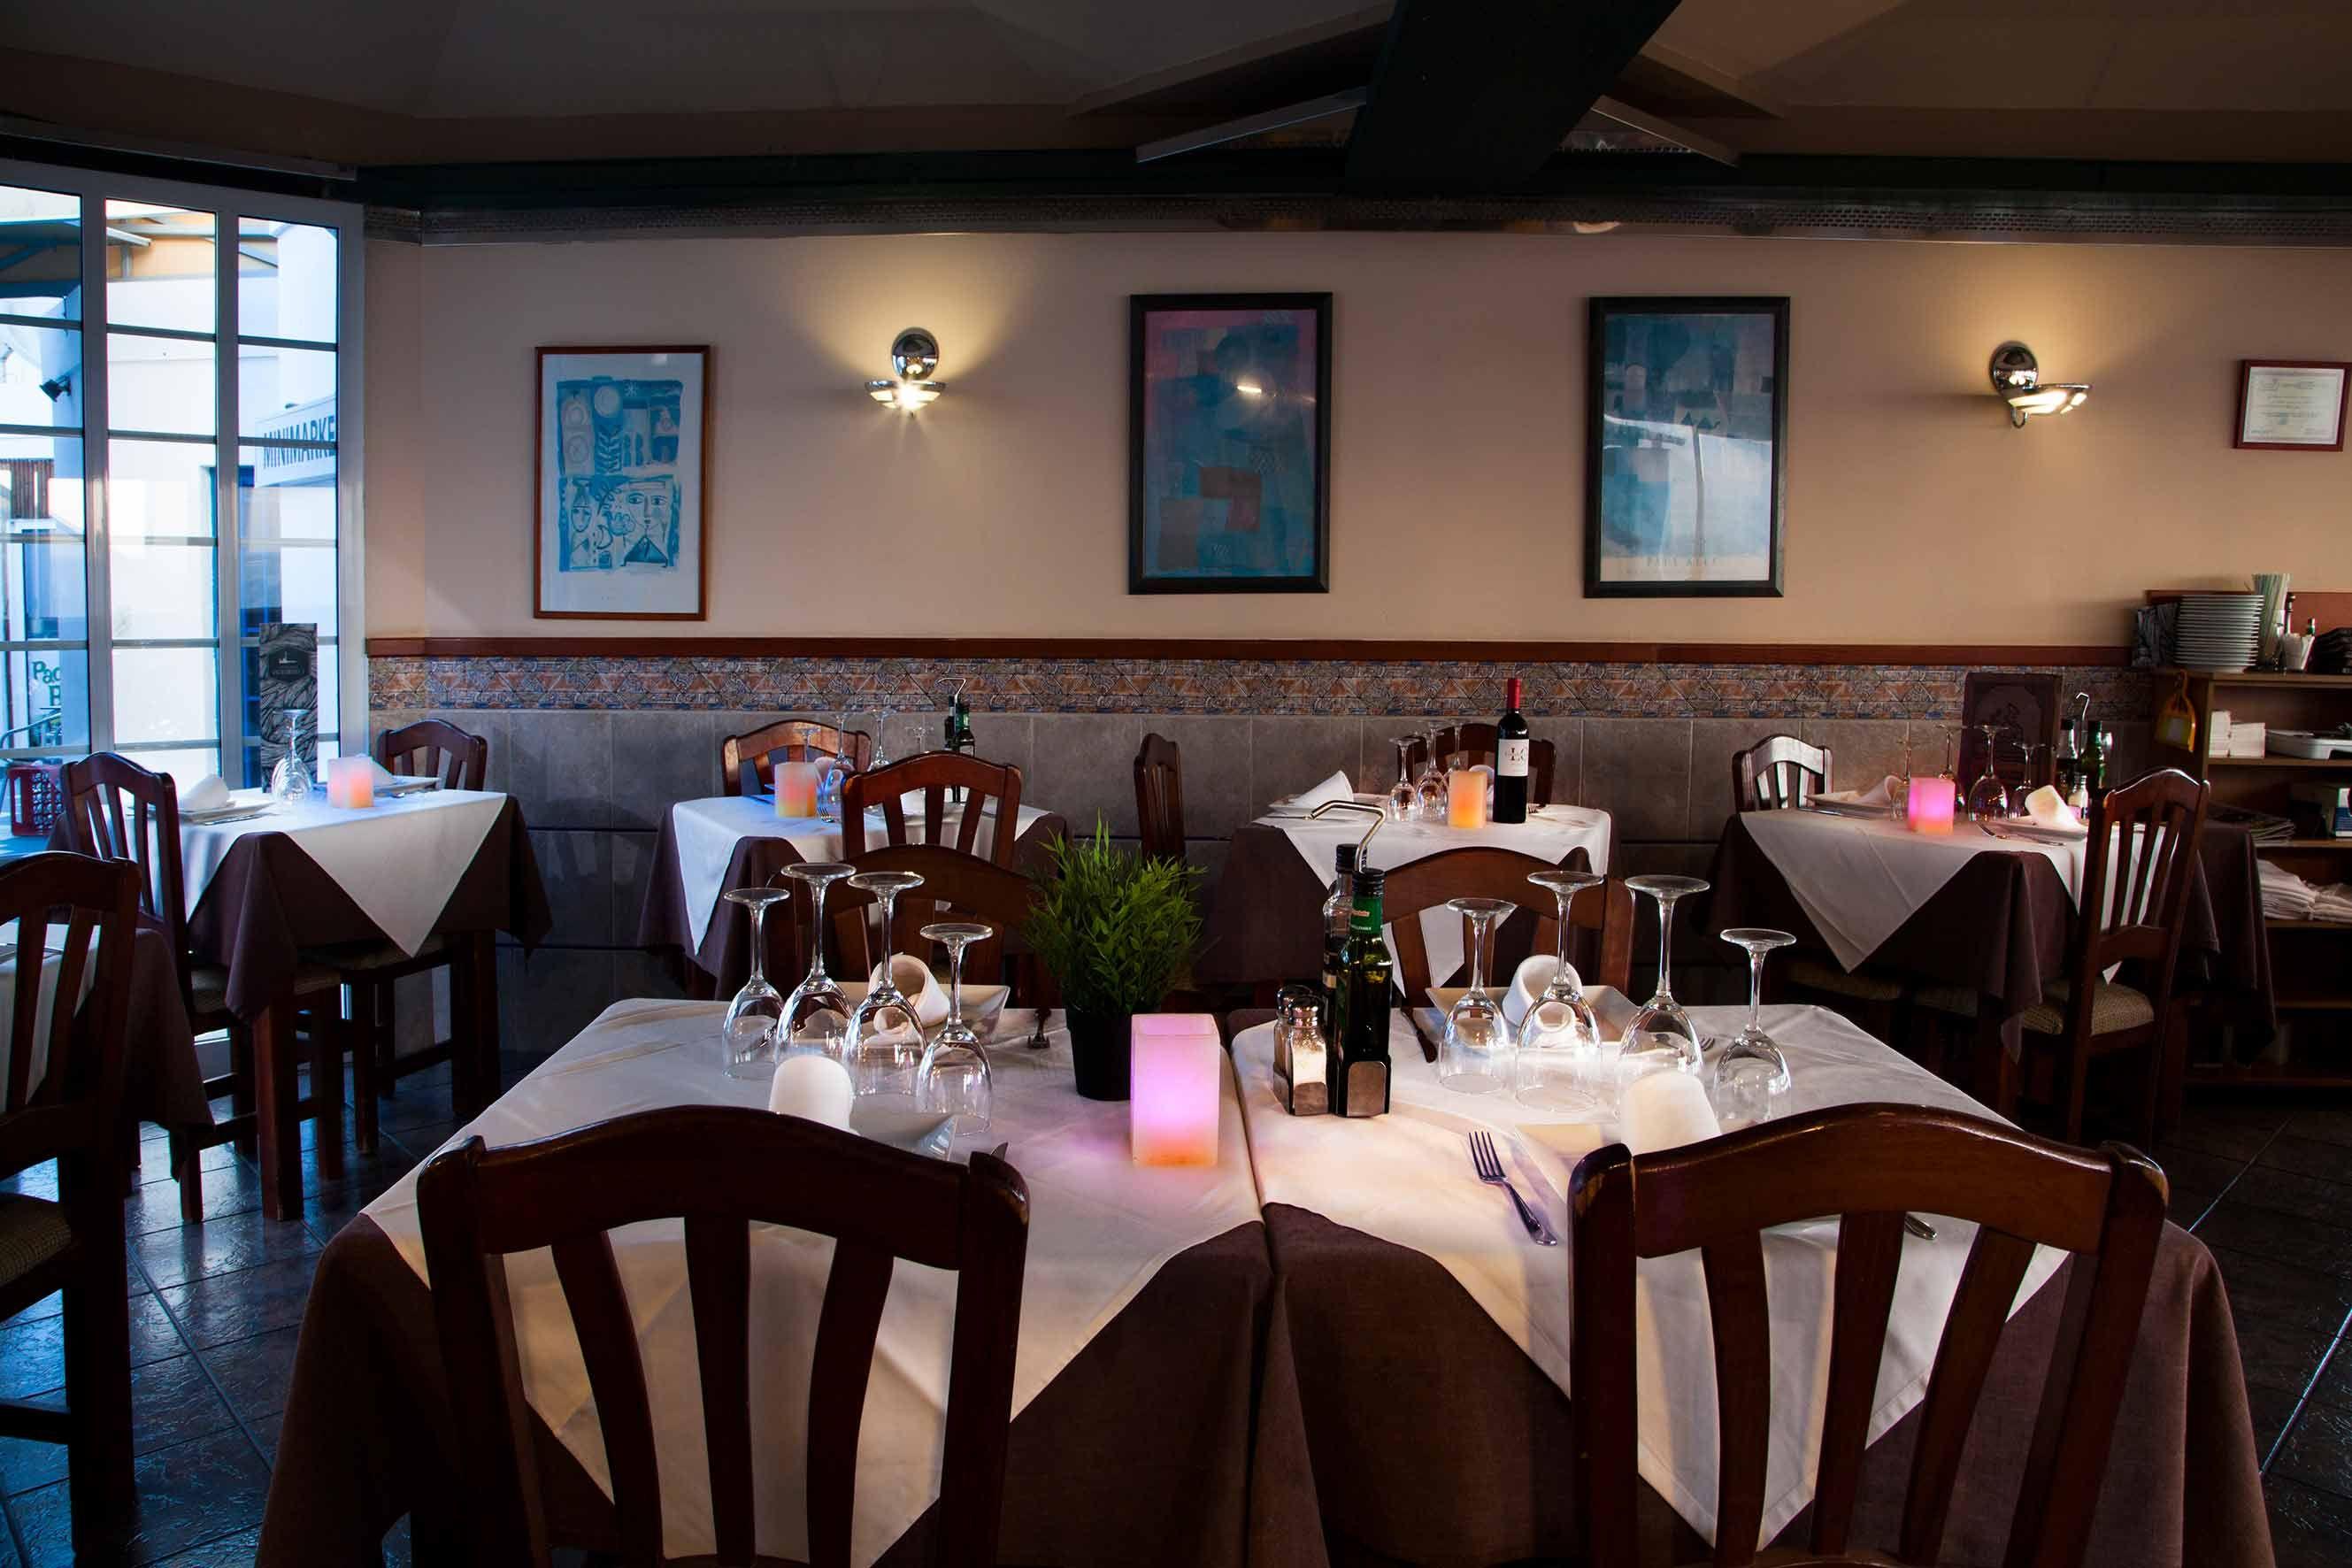 Foto 9 de Cocina internacional en San Bartolomé de Tirajana | Restaurante Escaleritas